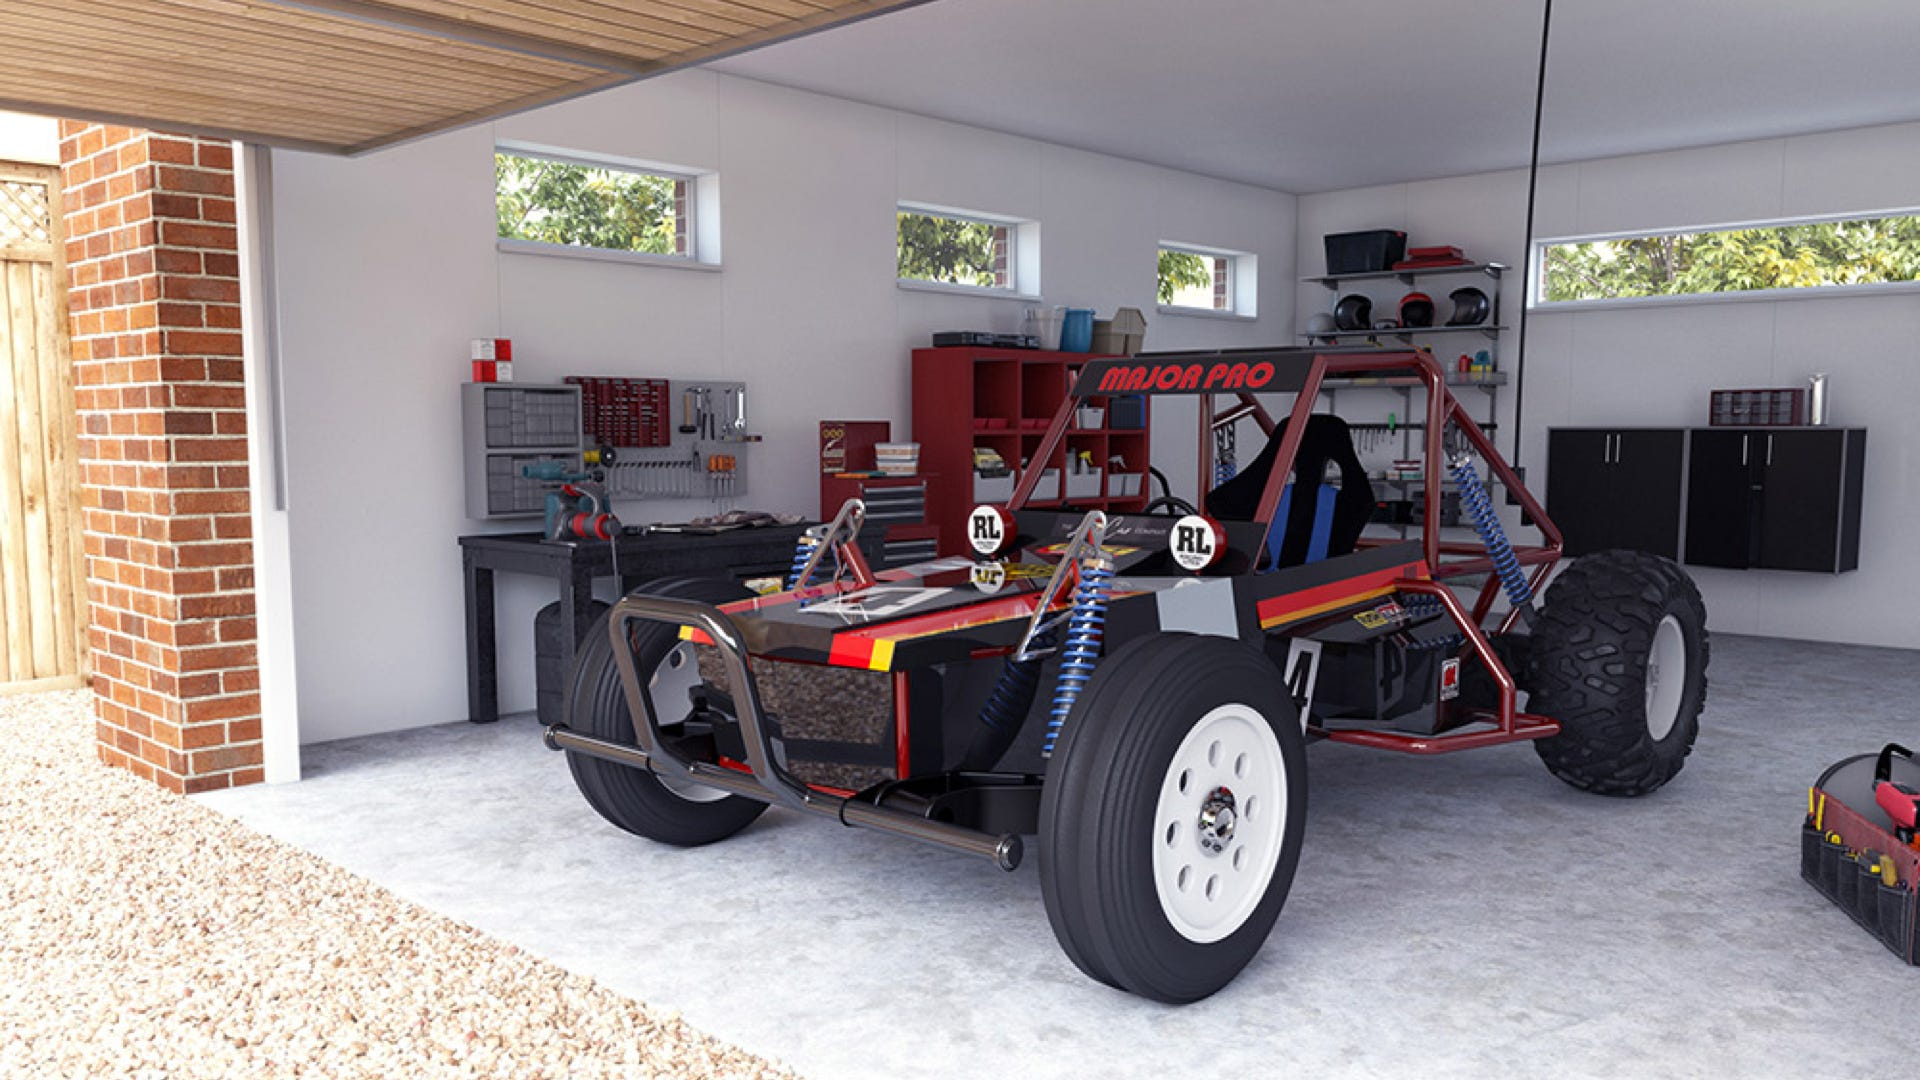 Wild One MAX RC Car, full size RC car